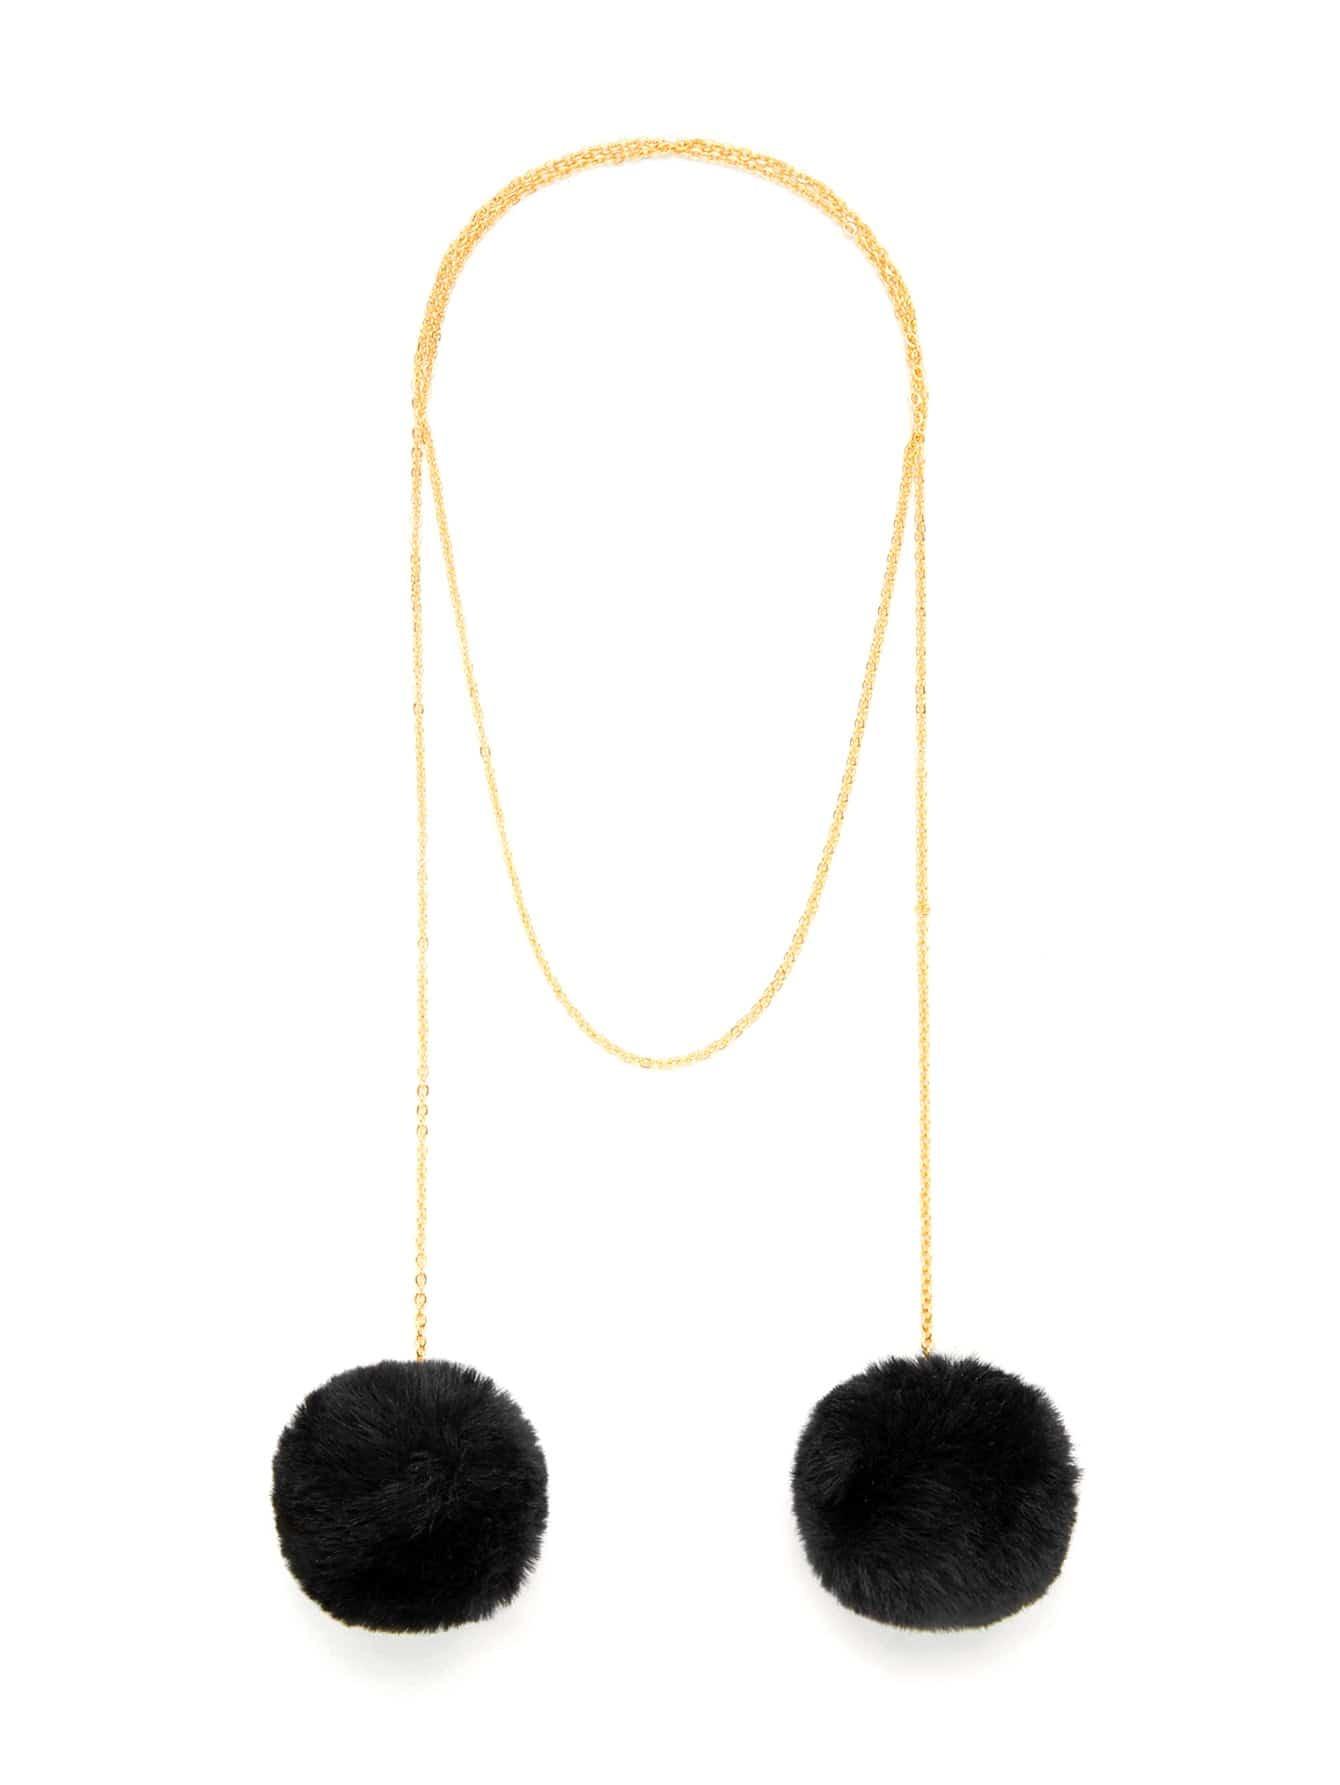 Double Pom Pom Detail Chain Necklace